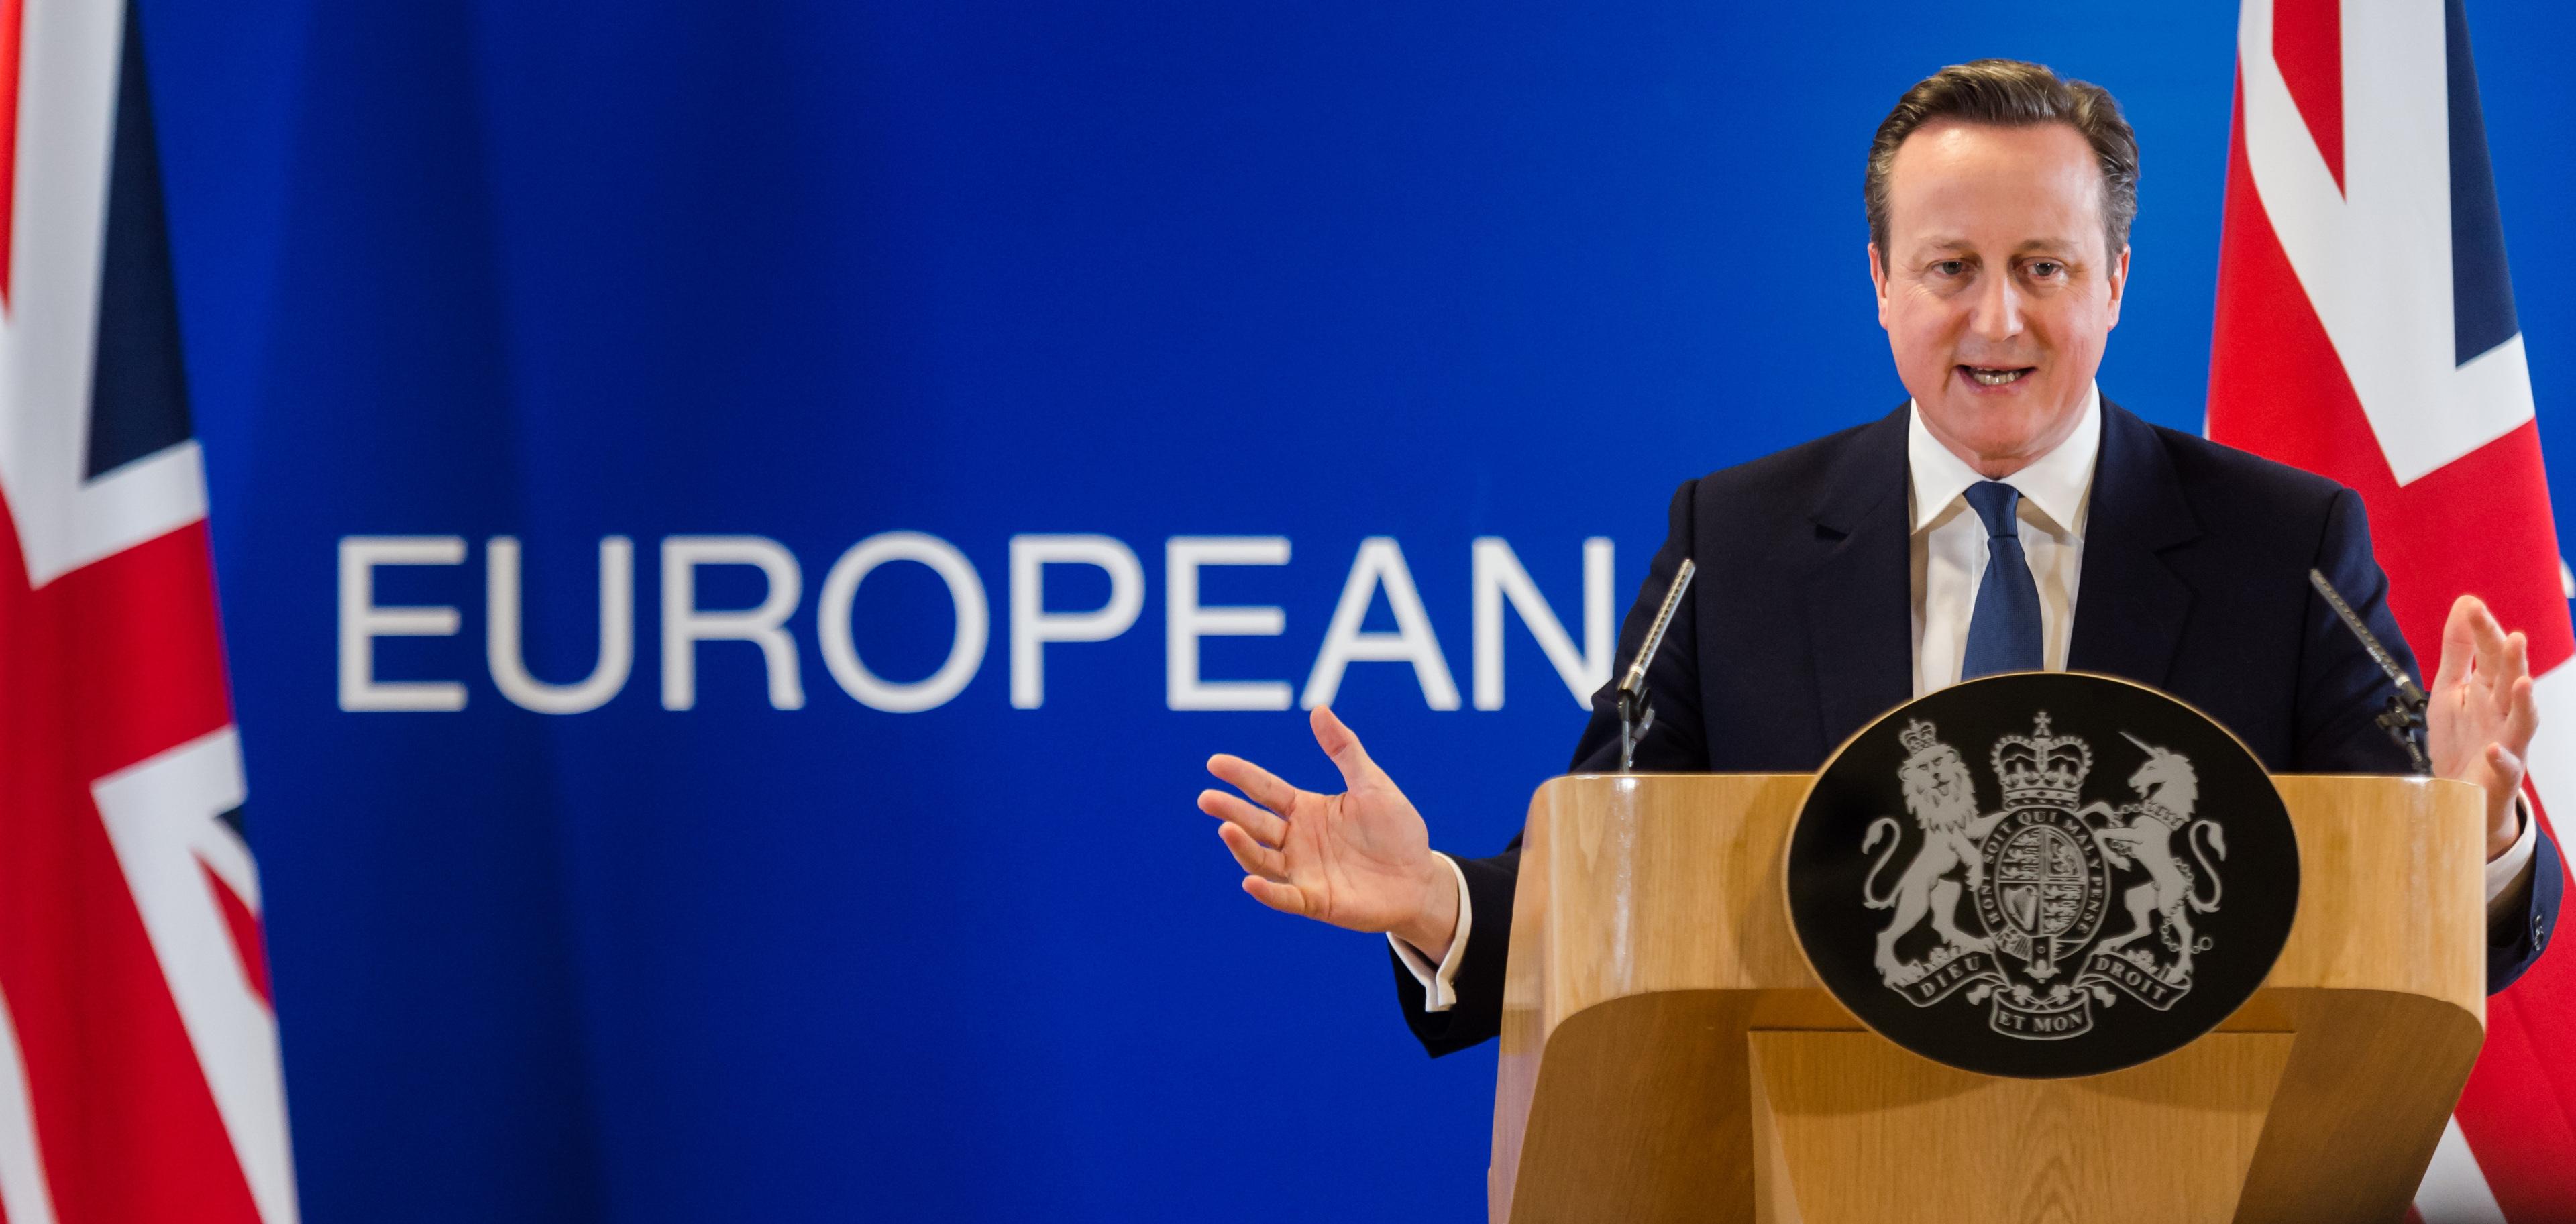 British Prime Minister David Cameron has set a date of June 23 for the crucial vote (AP/ Geert Vanden Wijngaert)